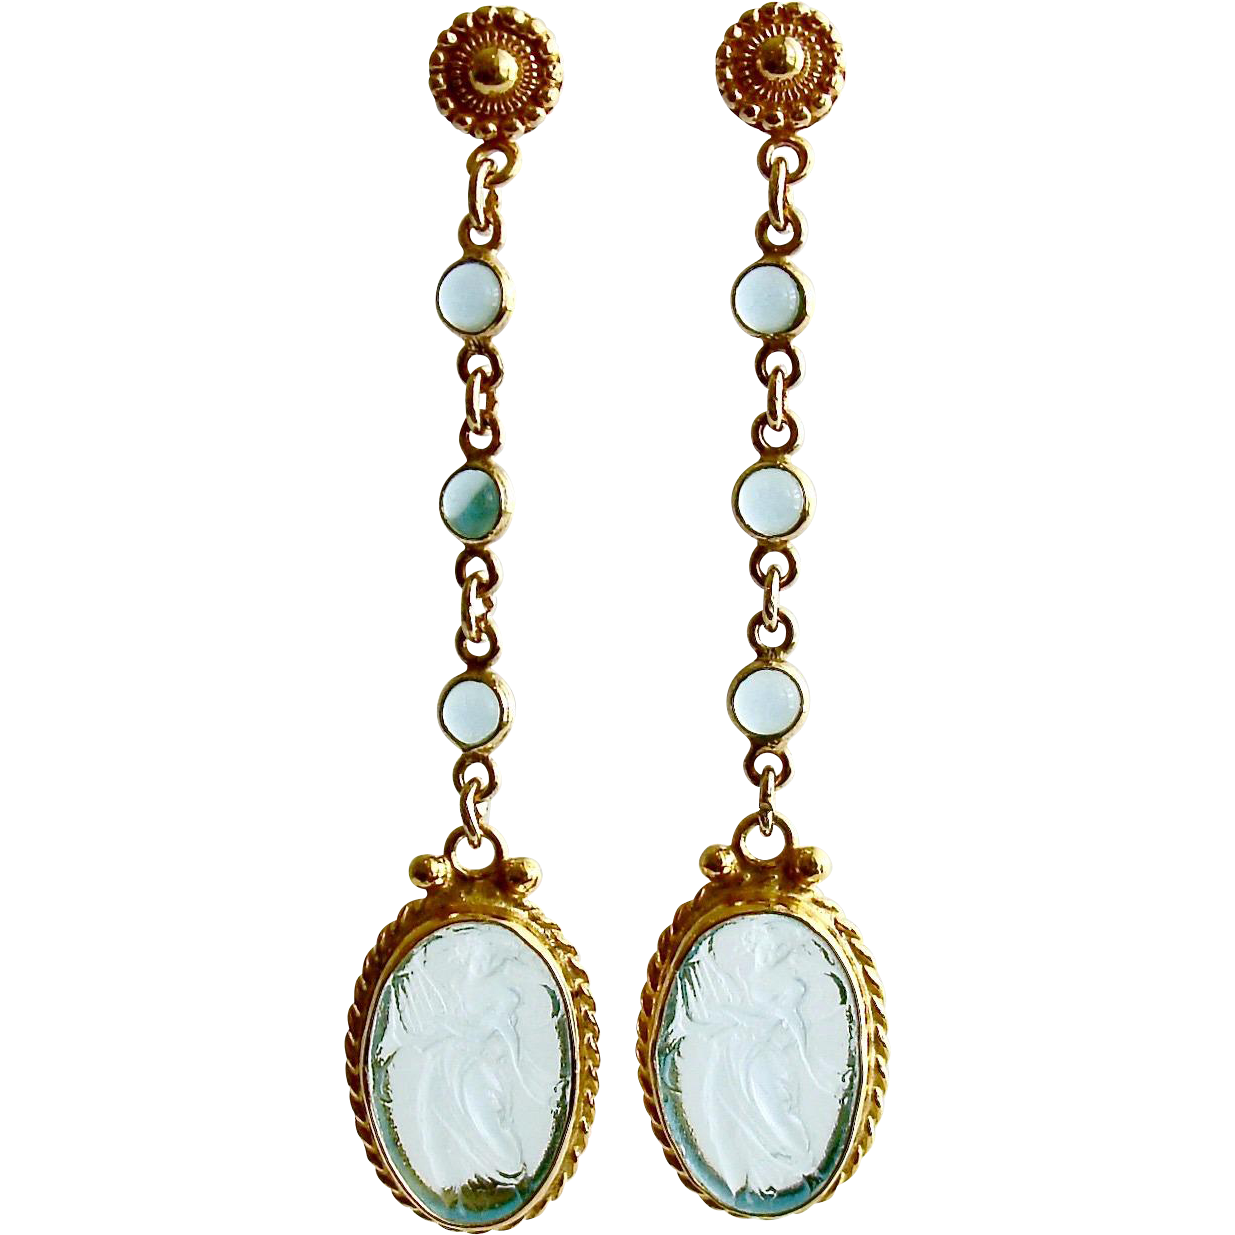 Aqua Quartz Venetian Glass Intaglio Cameo Dangle Earrings - Atrani Earrings